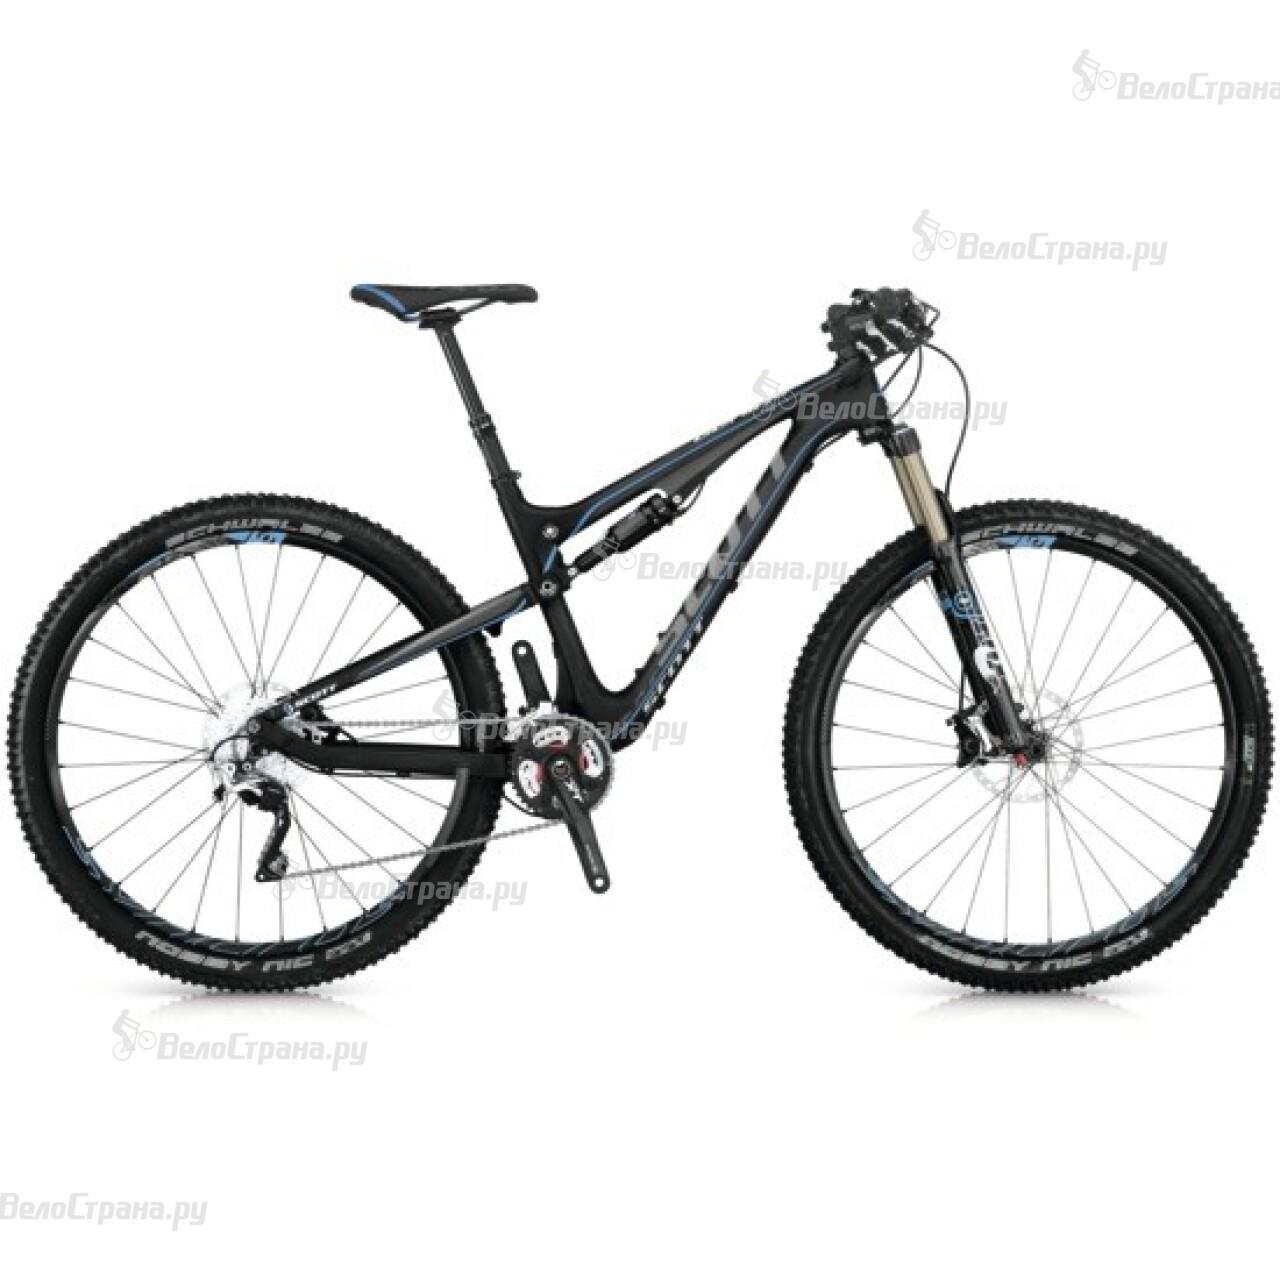 Велосипед Scott Genius 910 (2013) велосипед scott genius lt 700 tuned plus 2016